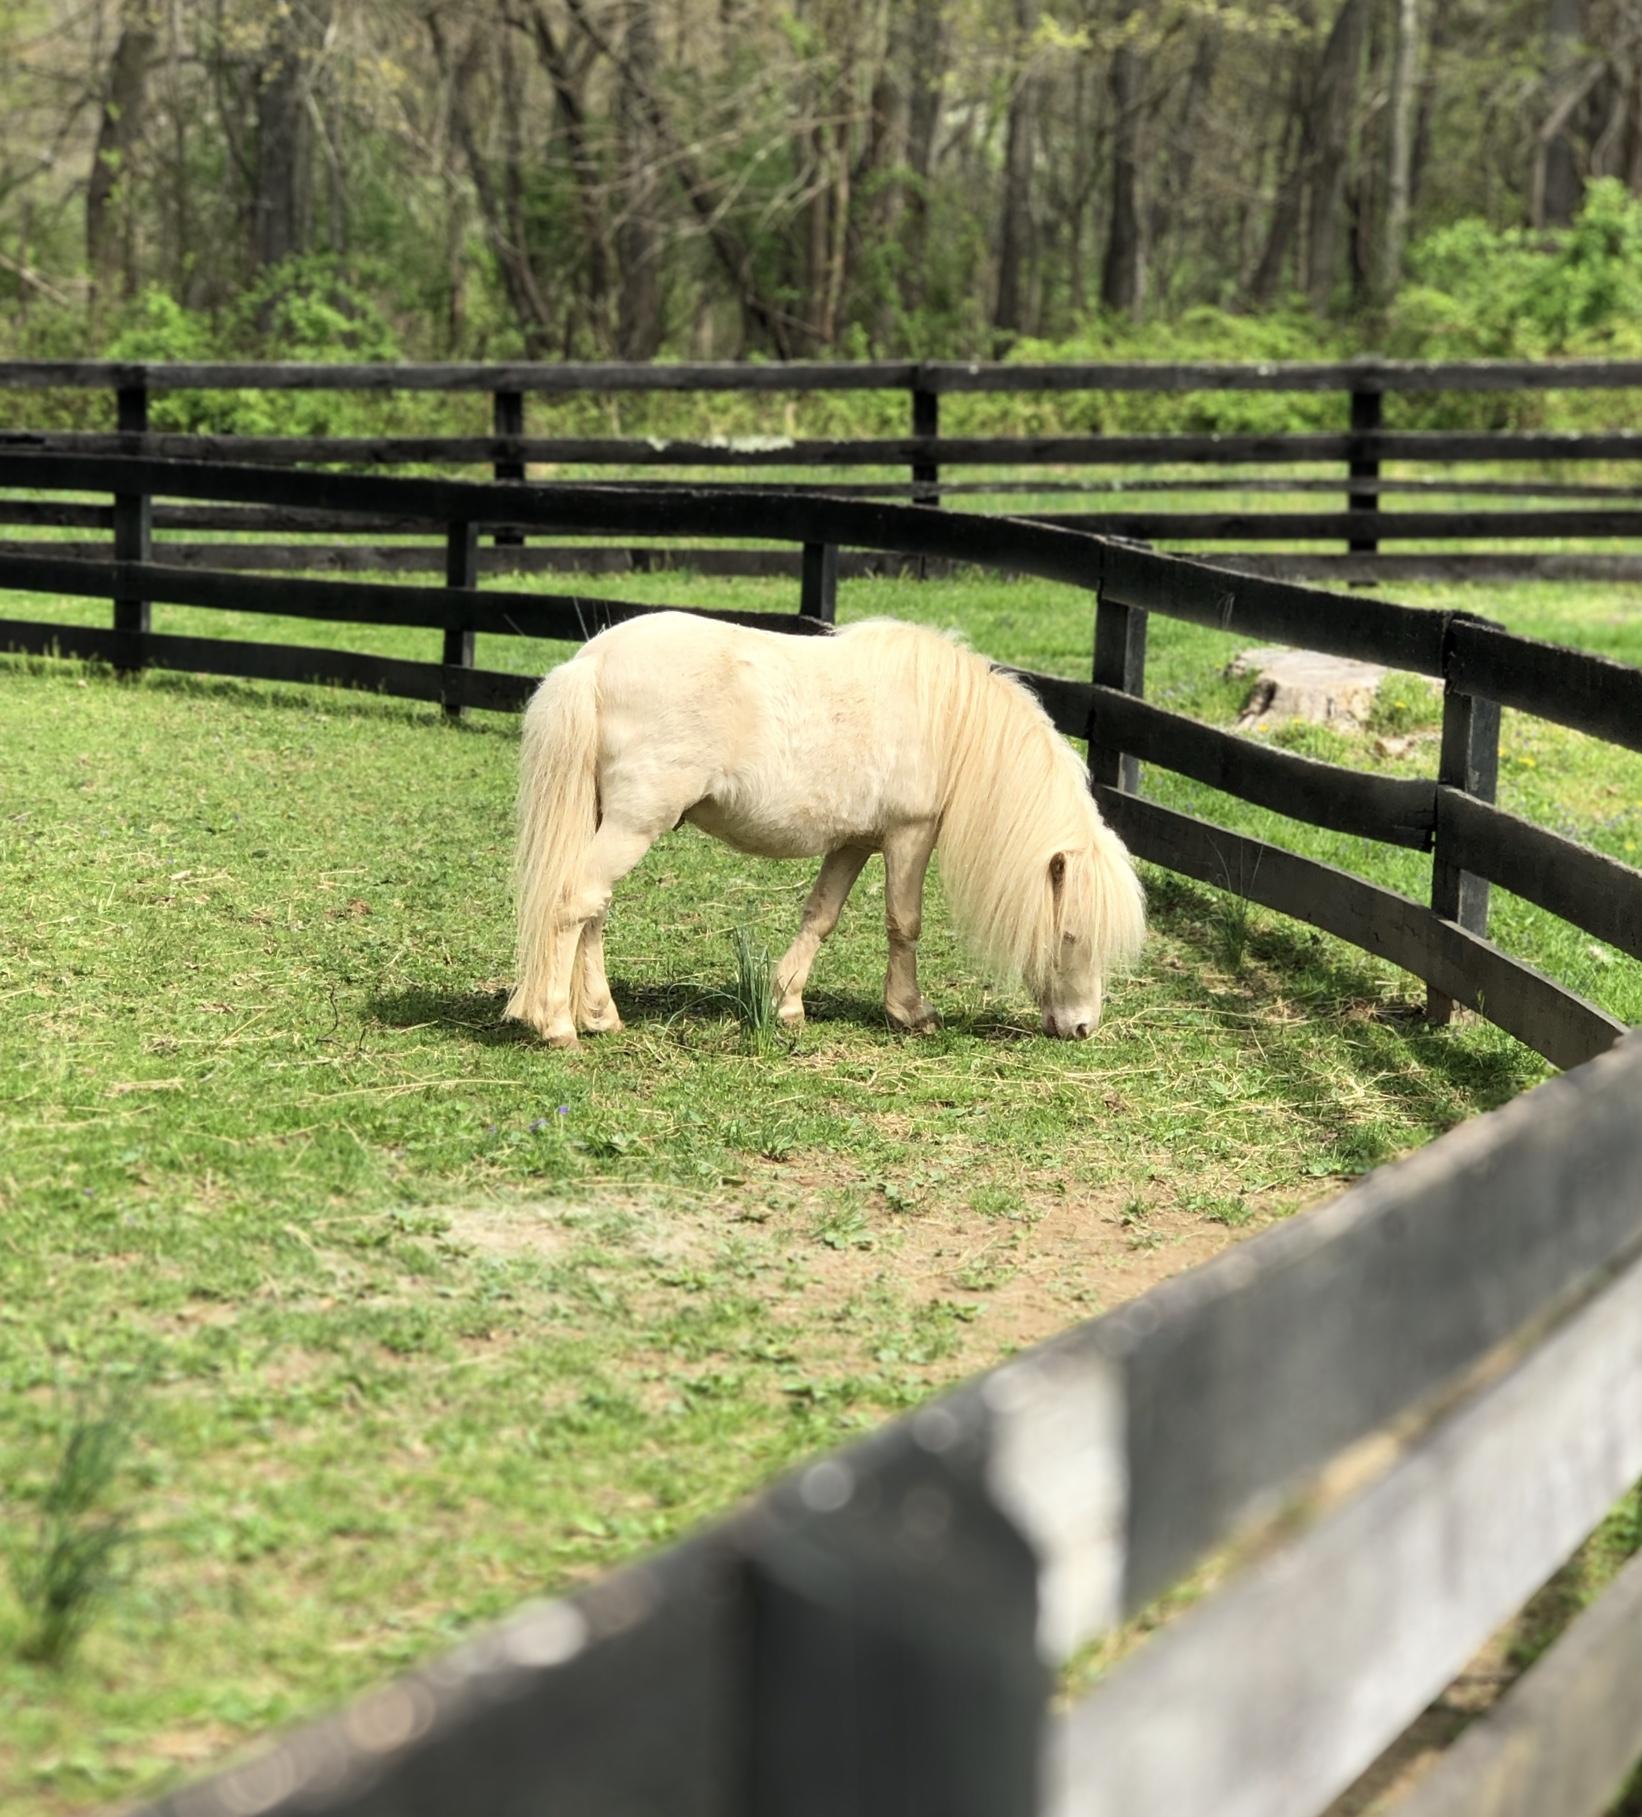 Mini-stallion Jack, another delightful Fursman resident grazing